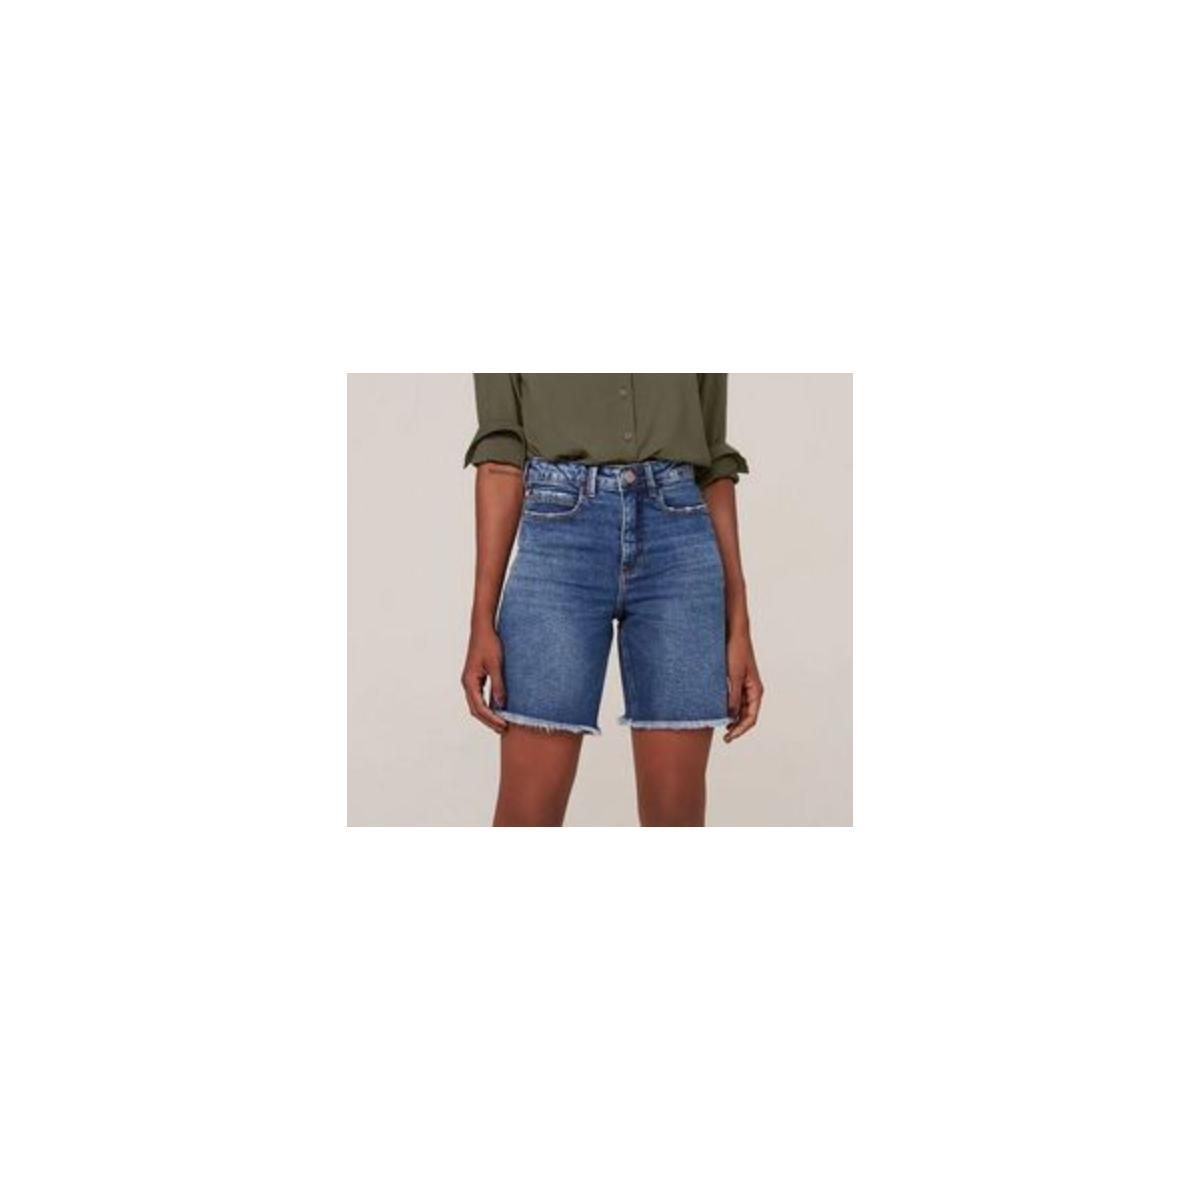 Bermuda Feminina Dzarm Zc4g 1asn Jeans